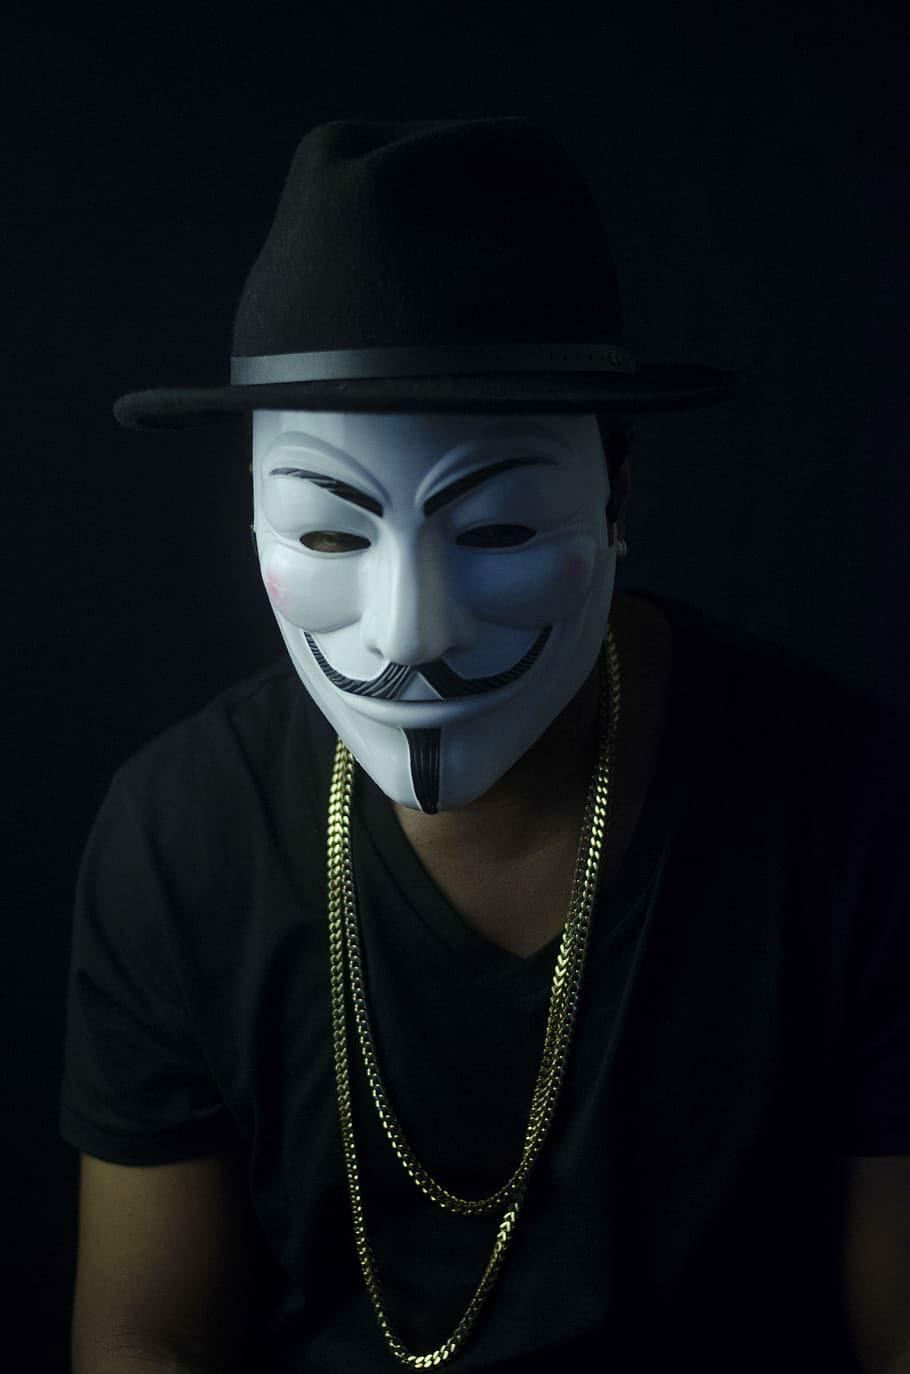 Joker Dp Images pics for download hd 2021